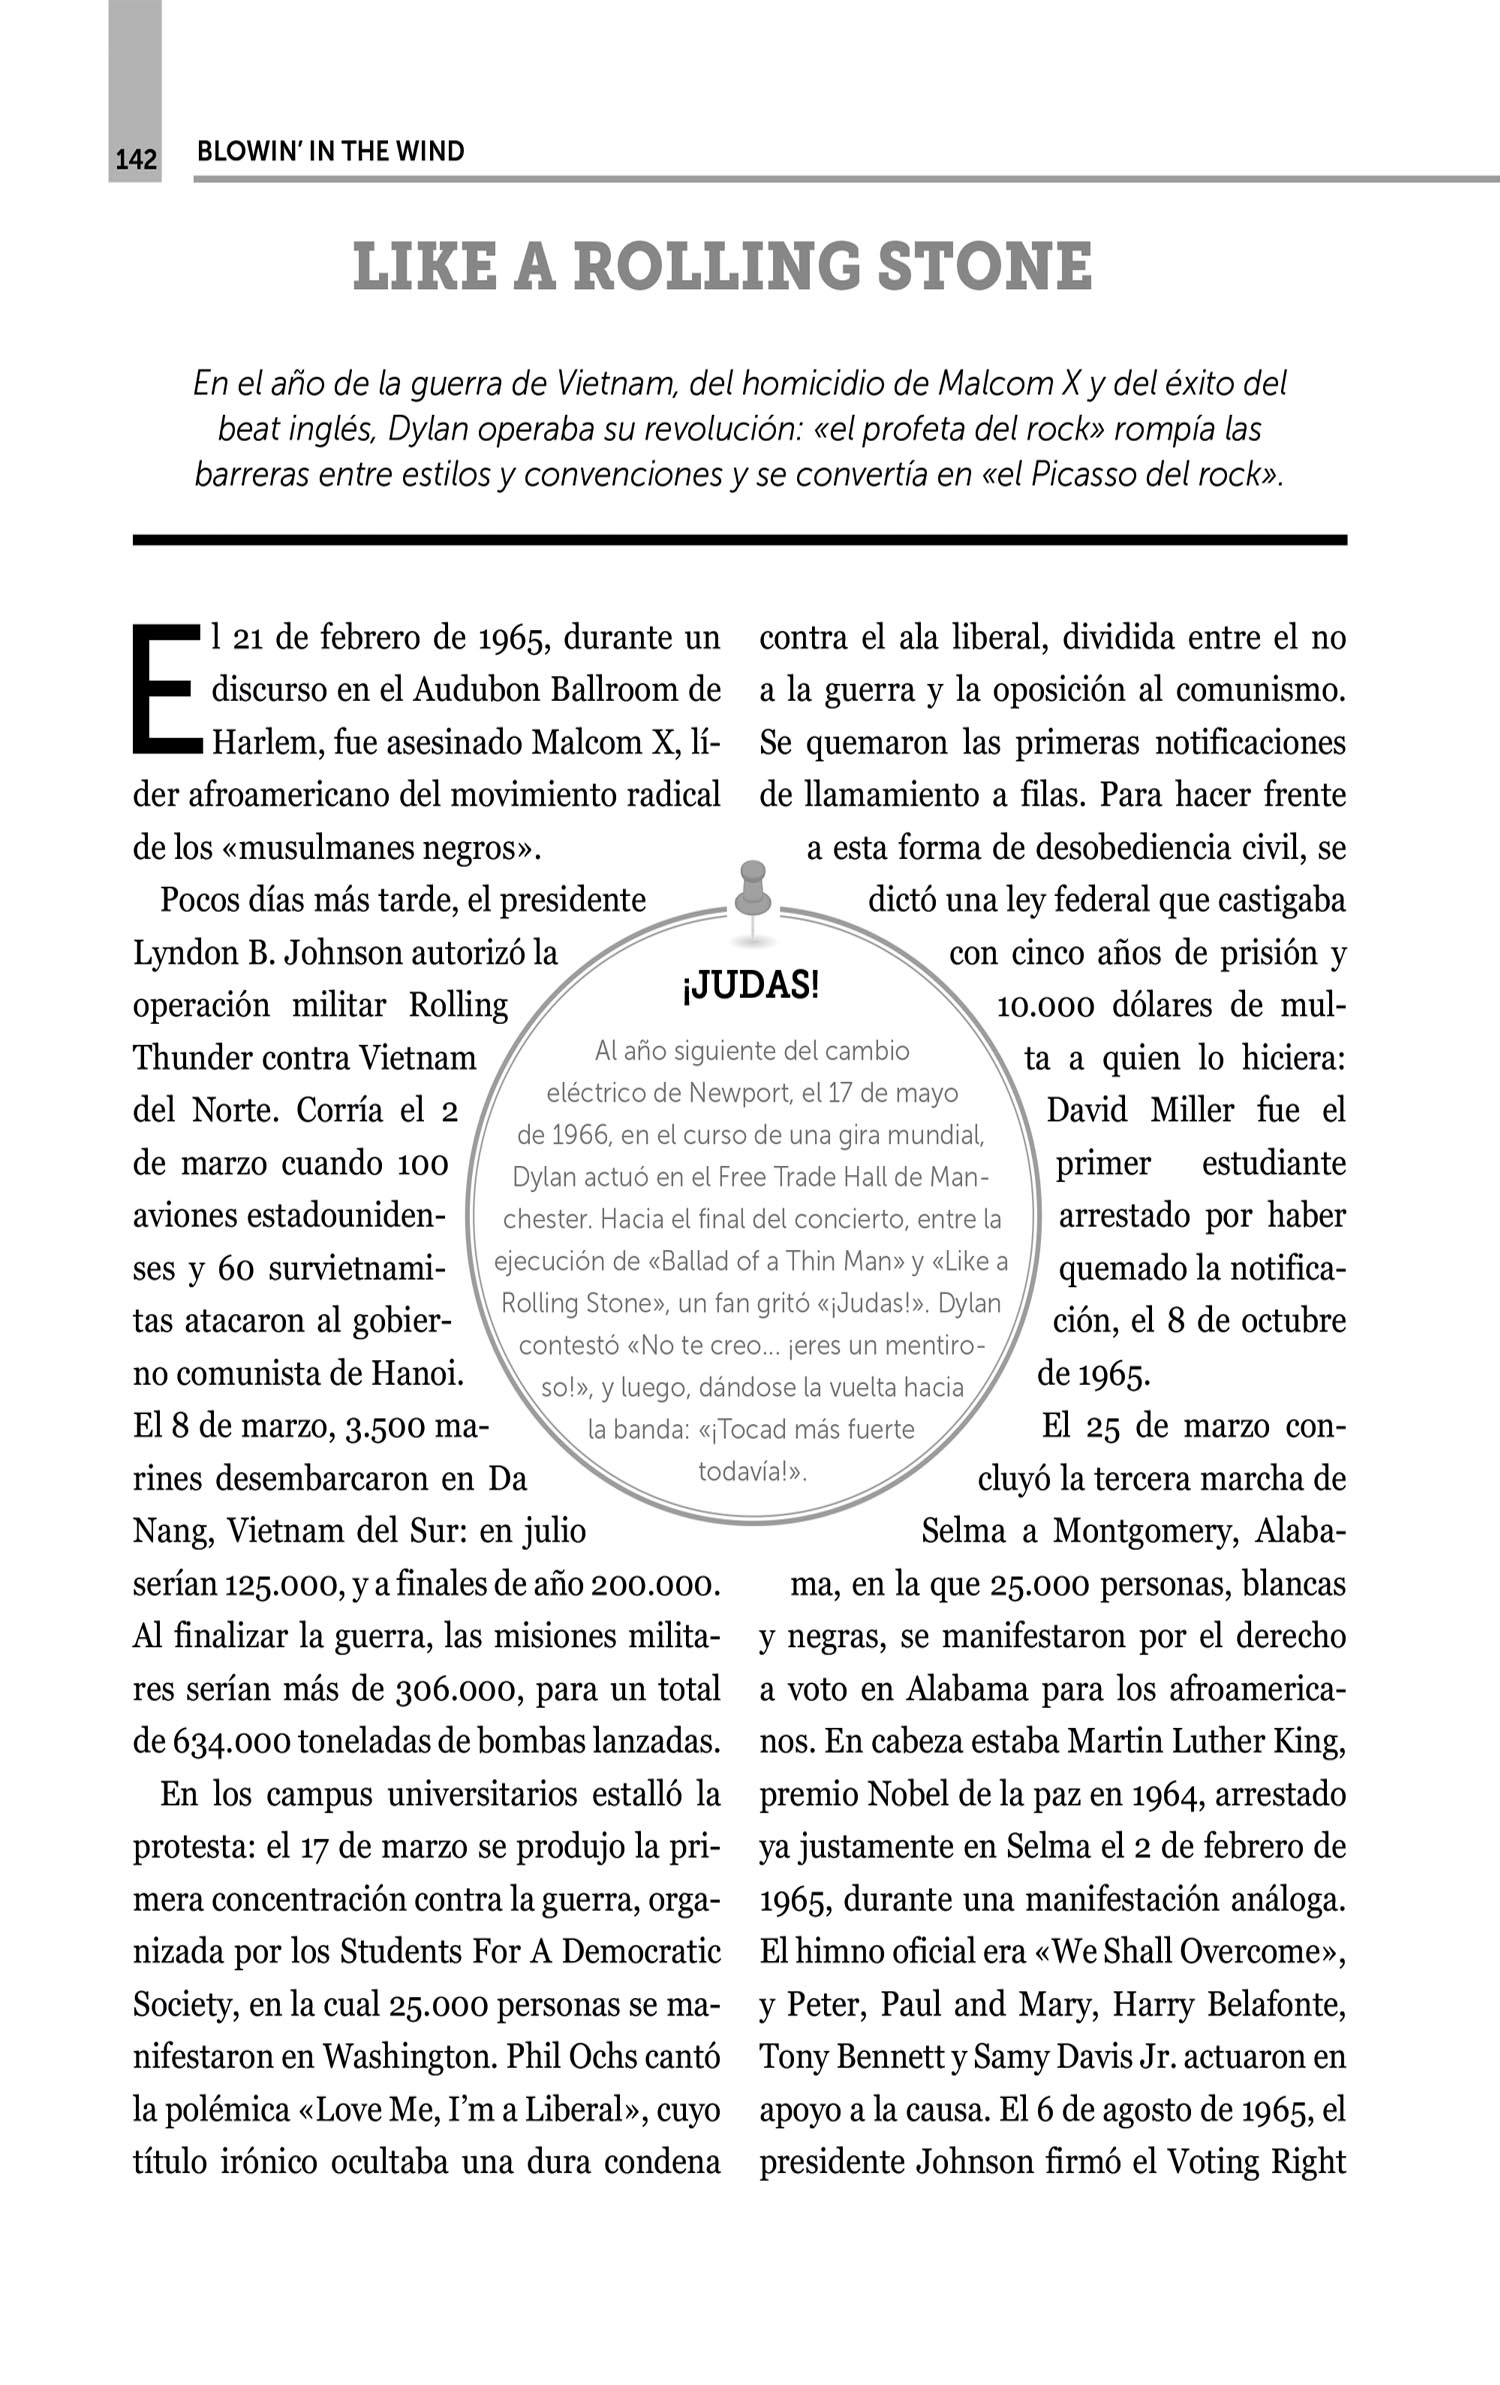 cronica3.jpg